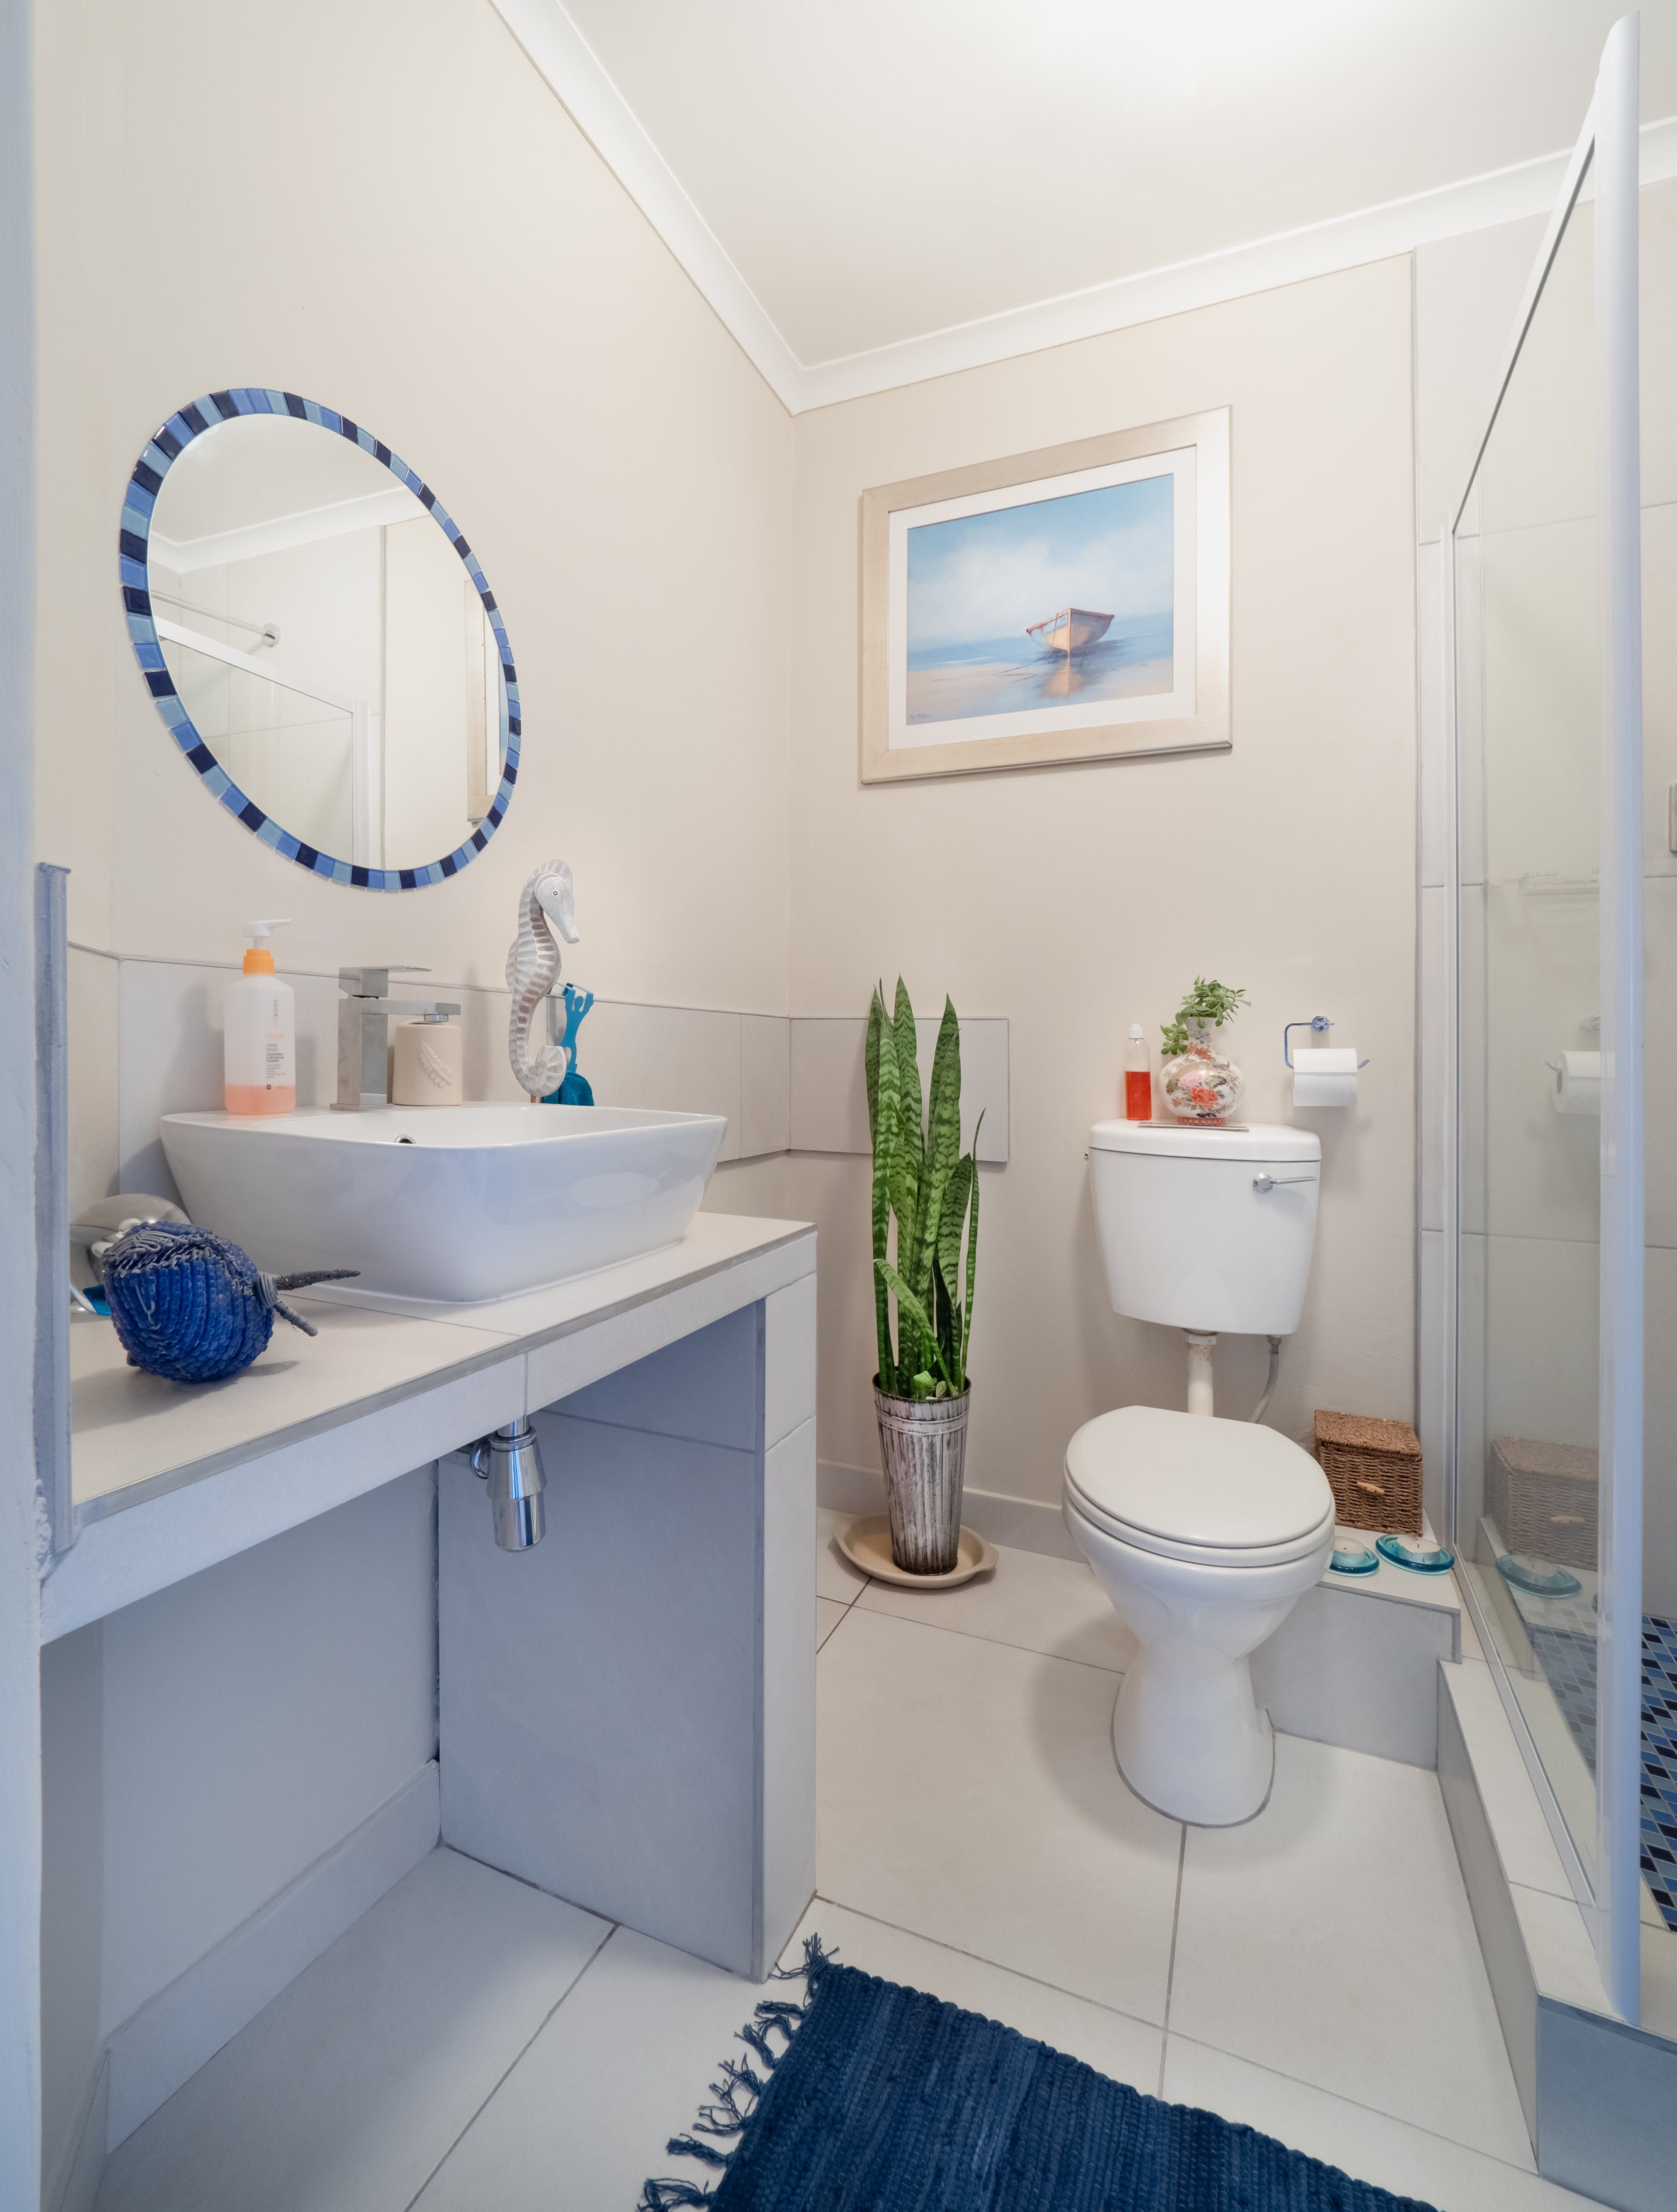 White Ceramic Toilet Bowl Beside Glass Wall